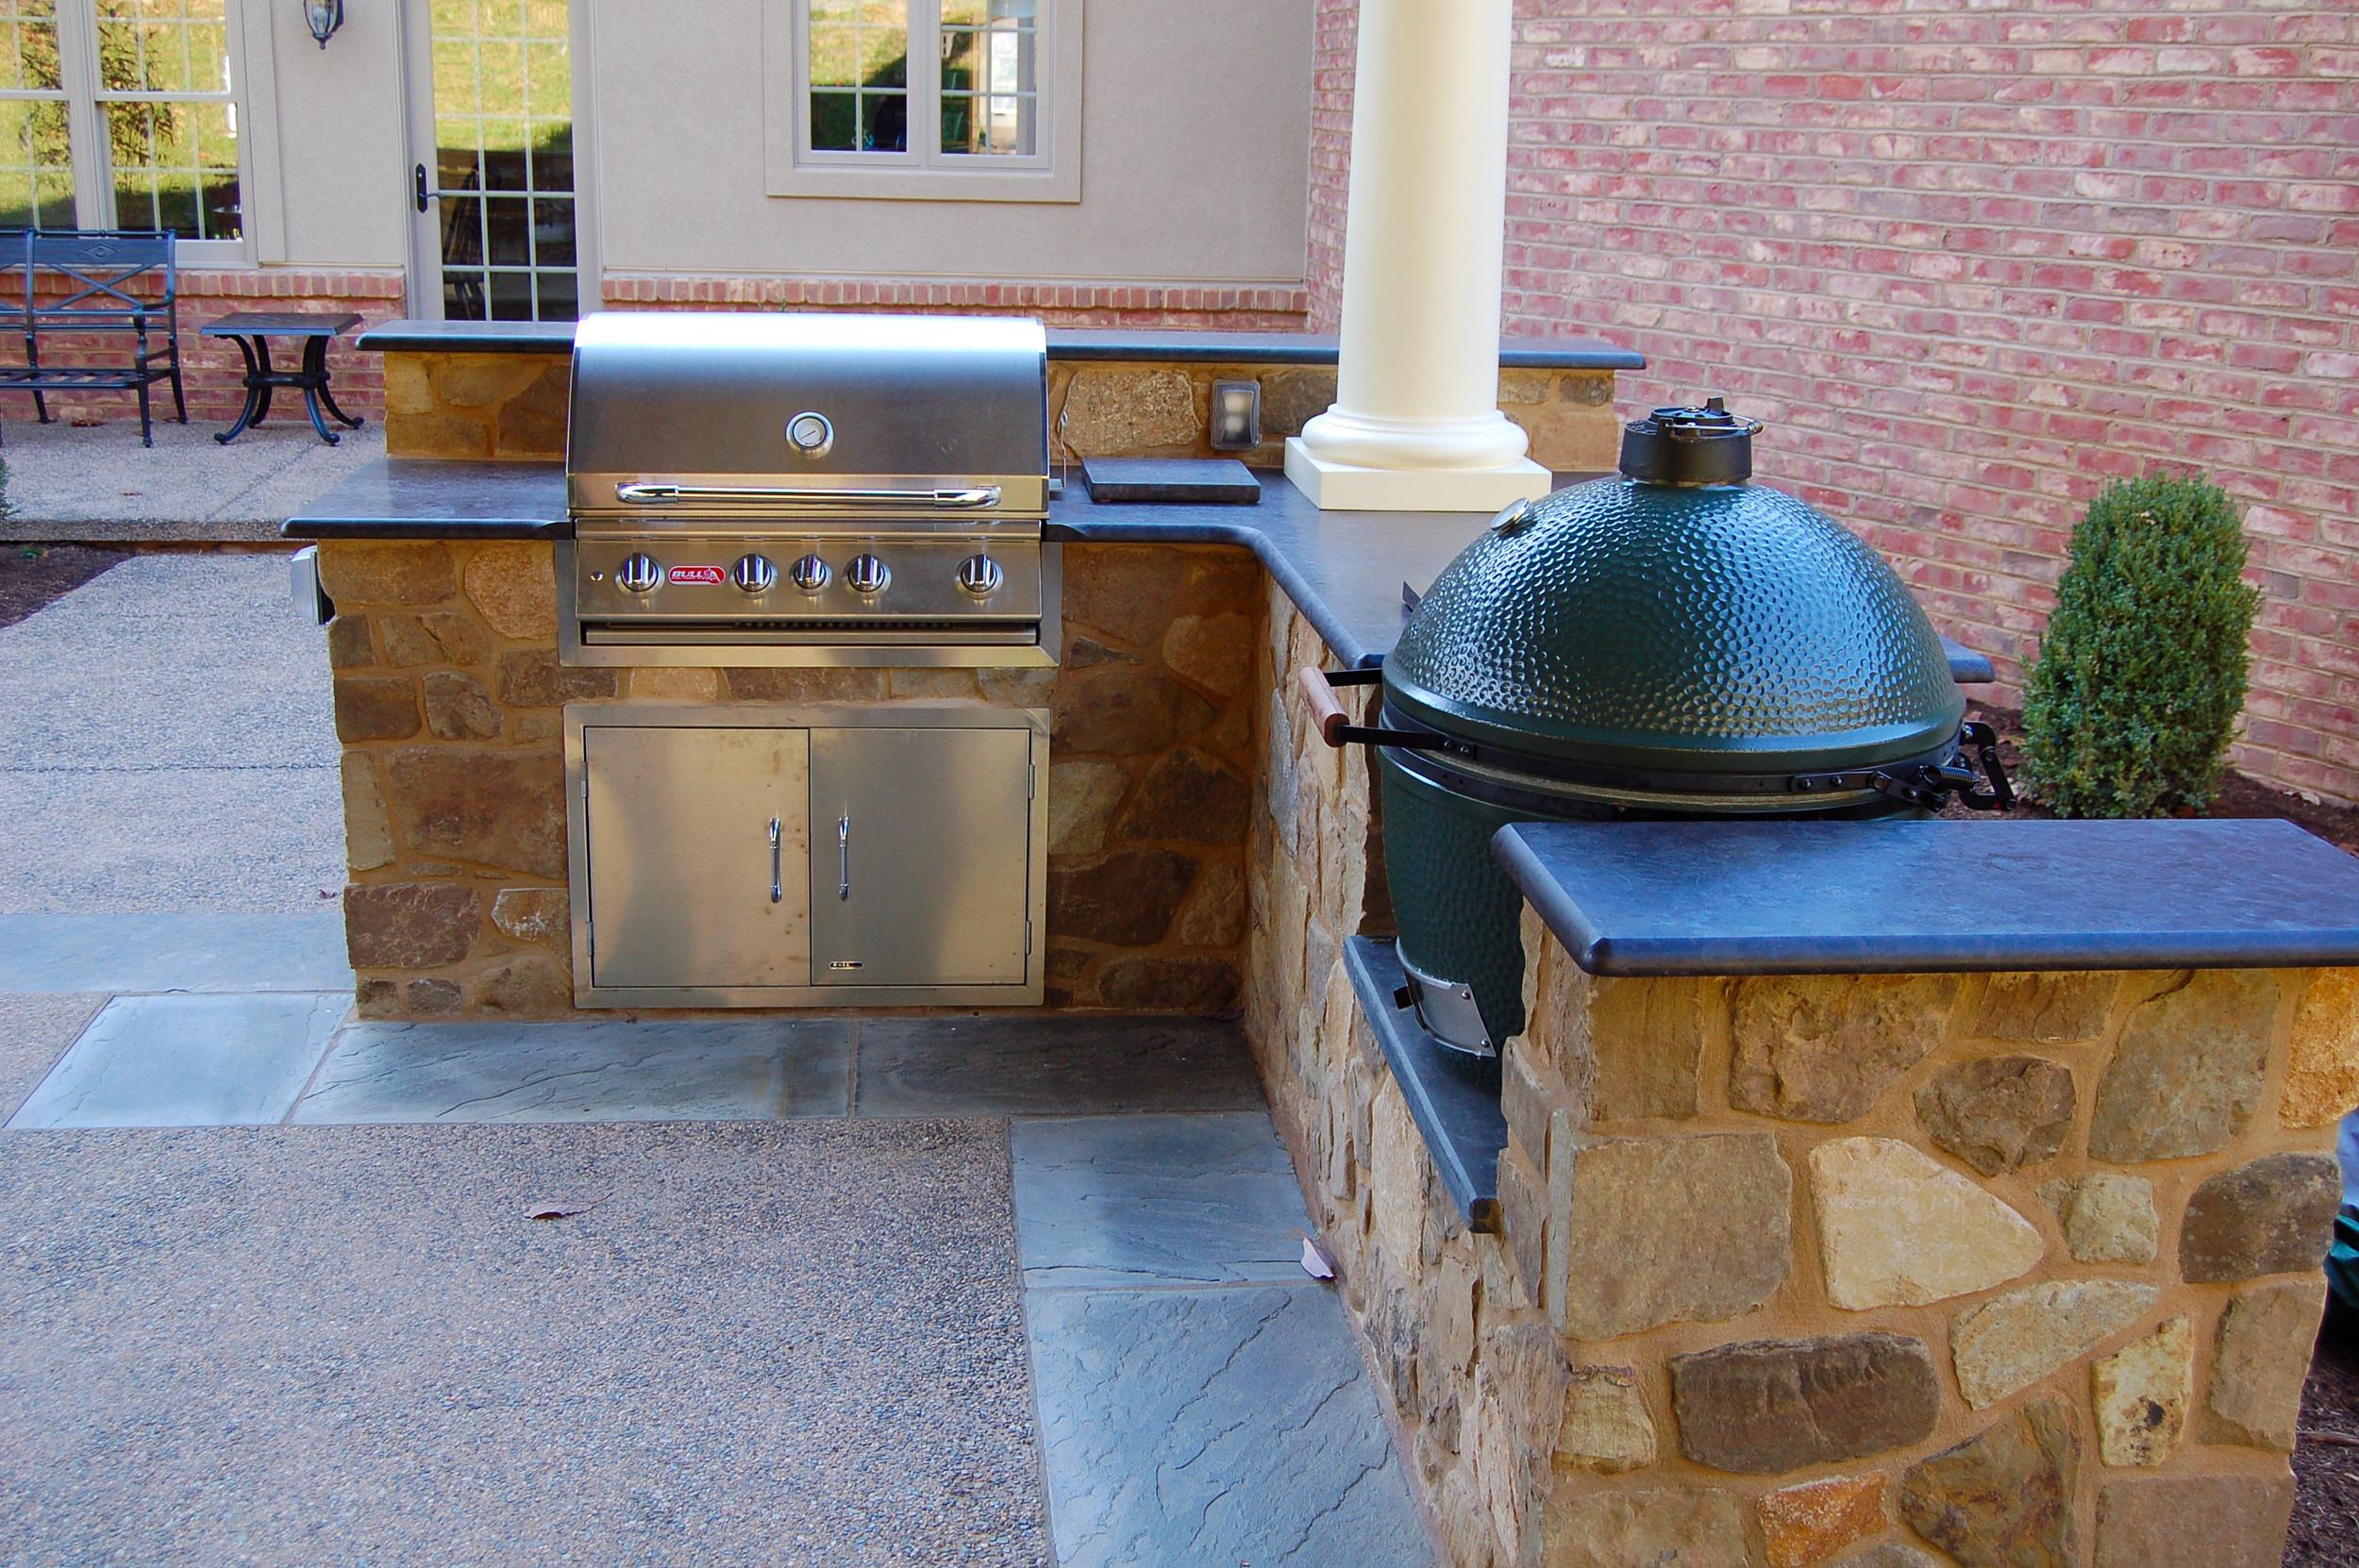 Outdoor Kitchen in York, PA